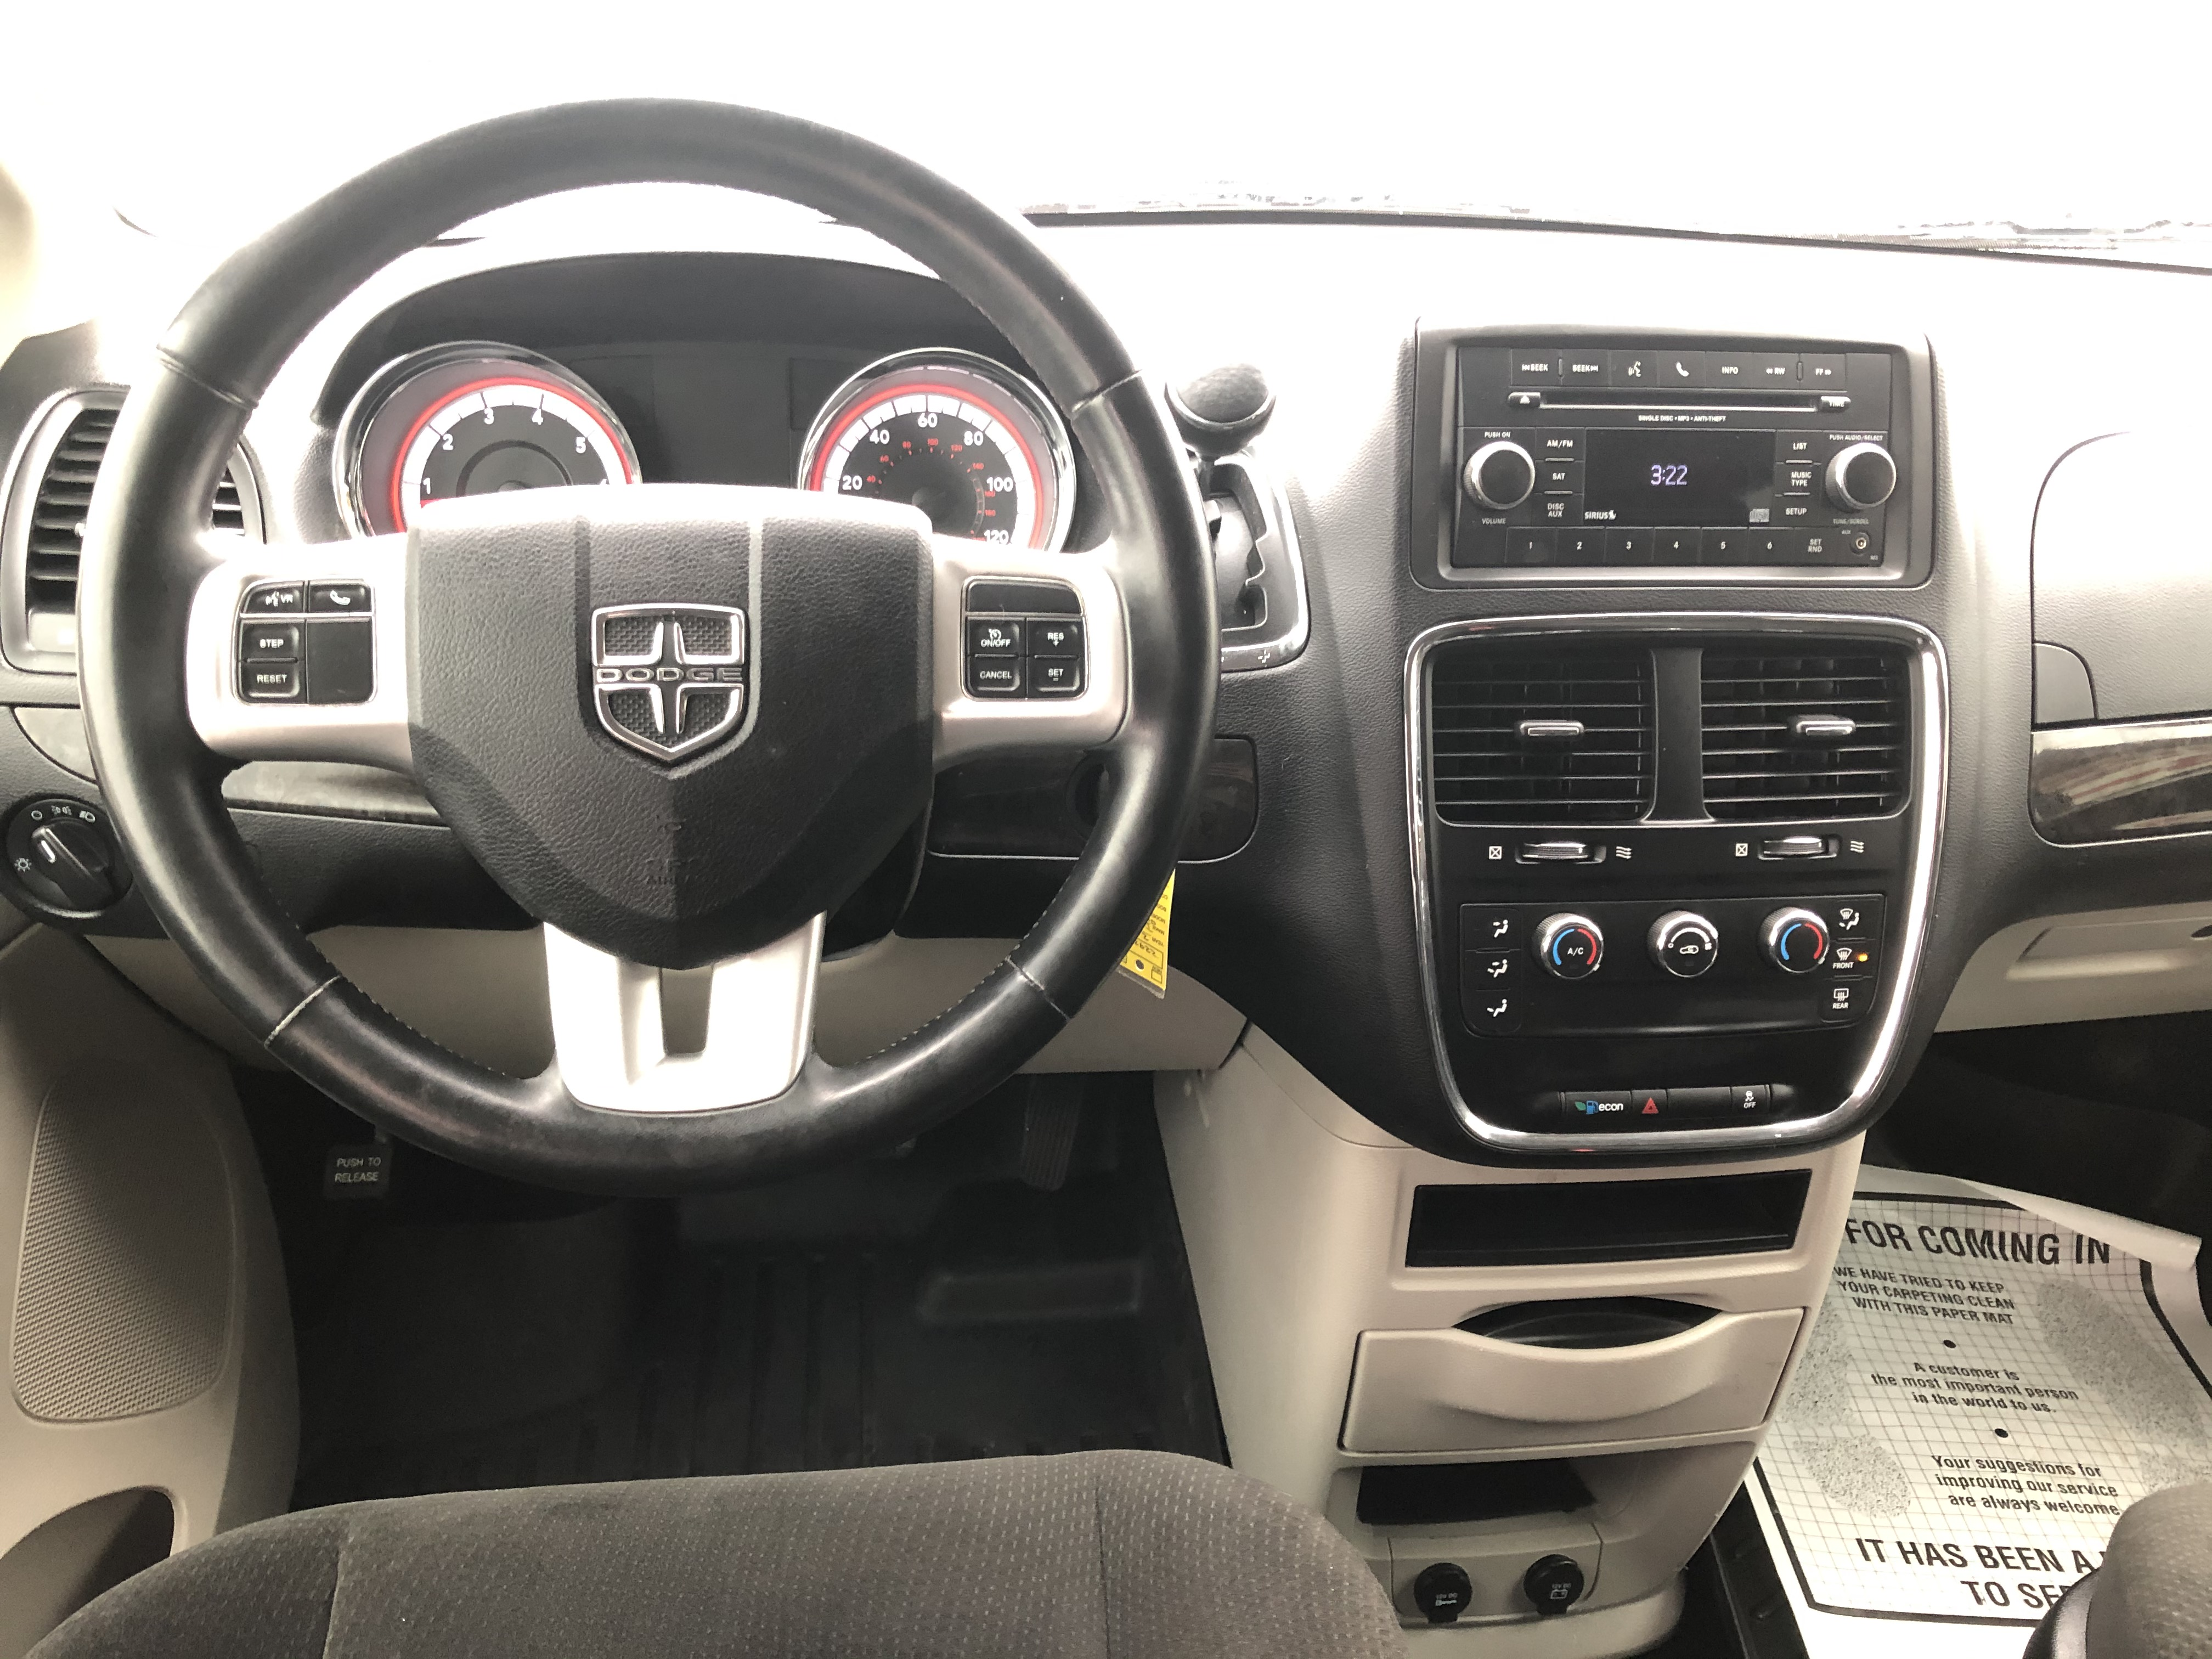 used vehicle - Passenger Van DODGE GRAND CARAVAN 2016